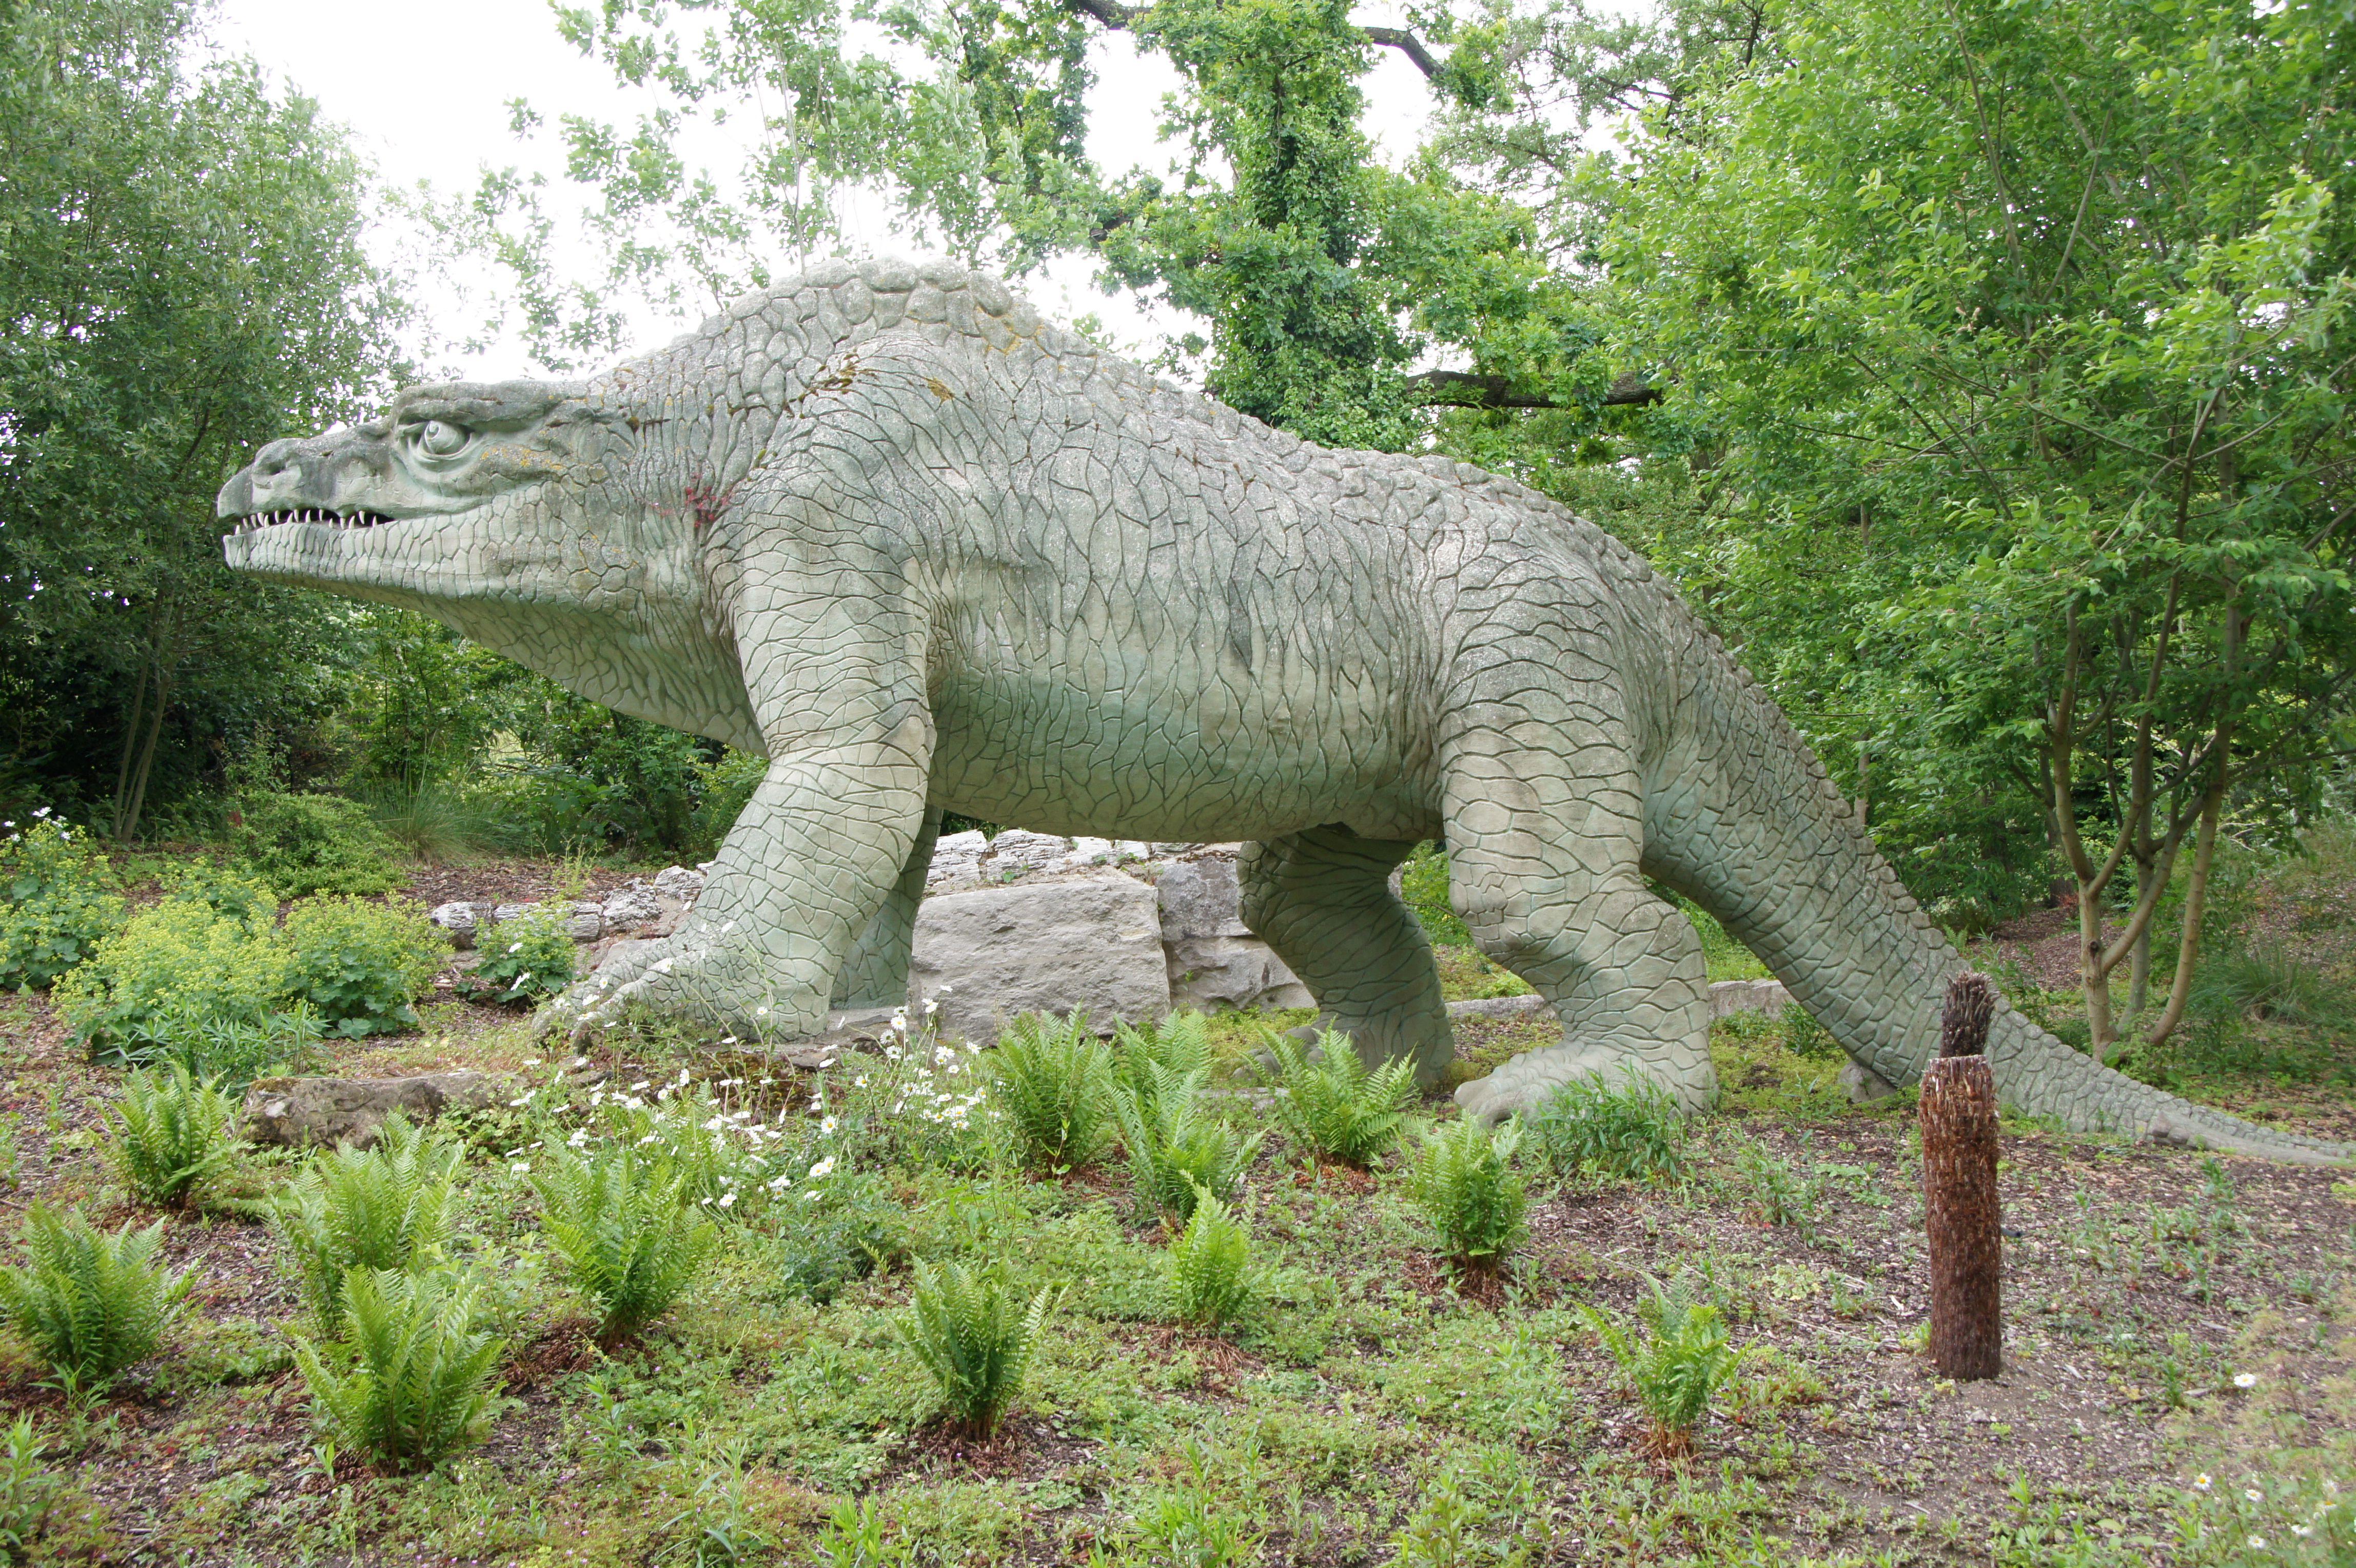 Crytsal_Palace_Megalosaurus.jpg